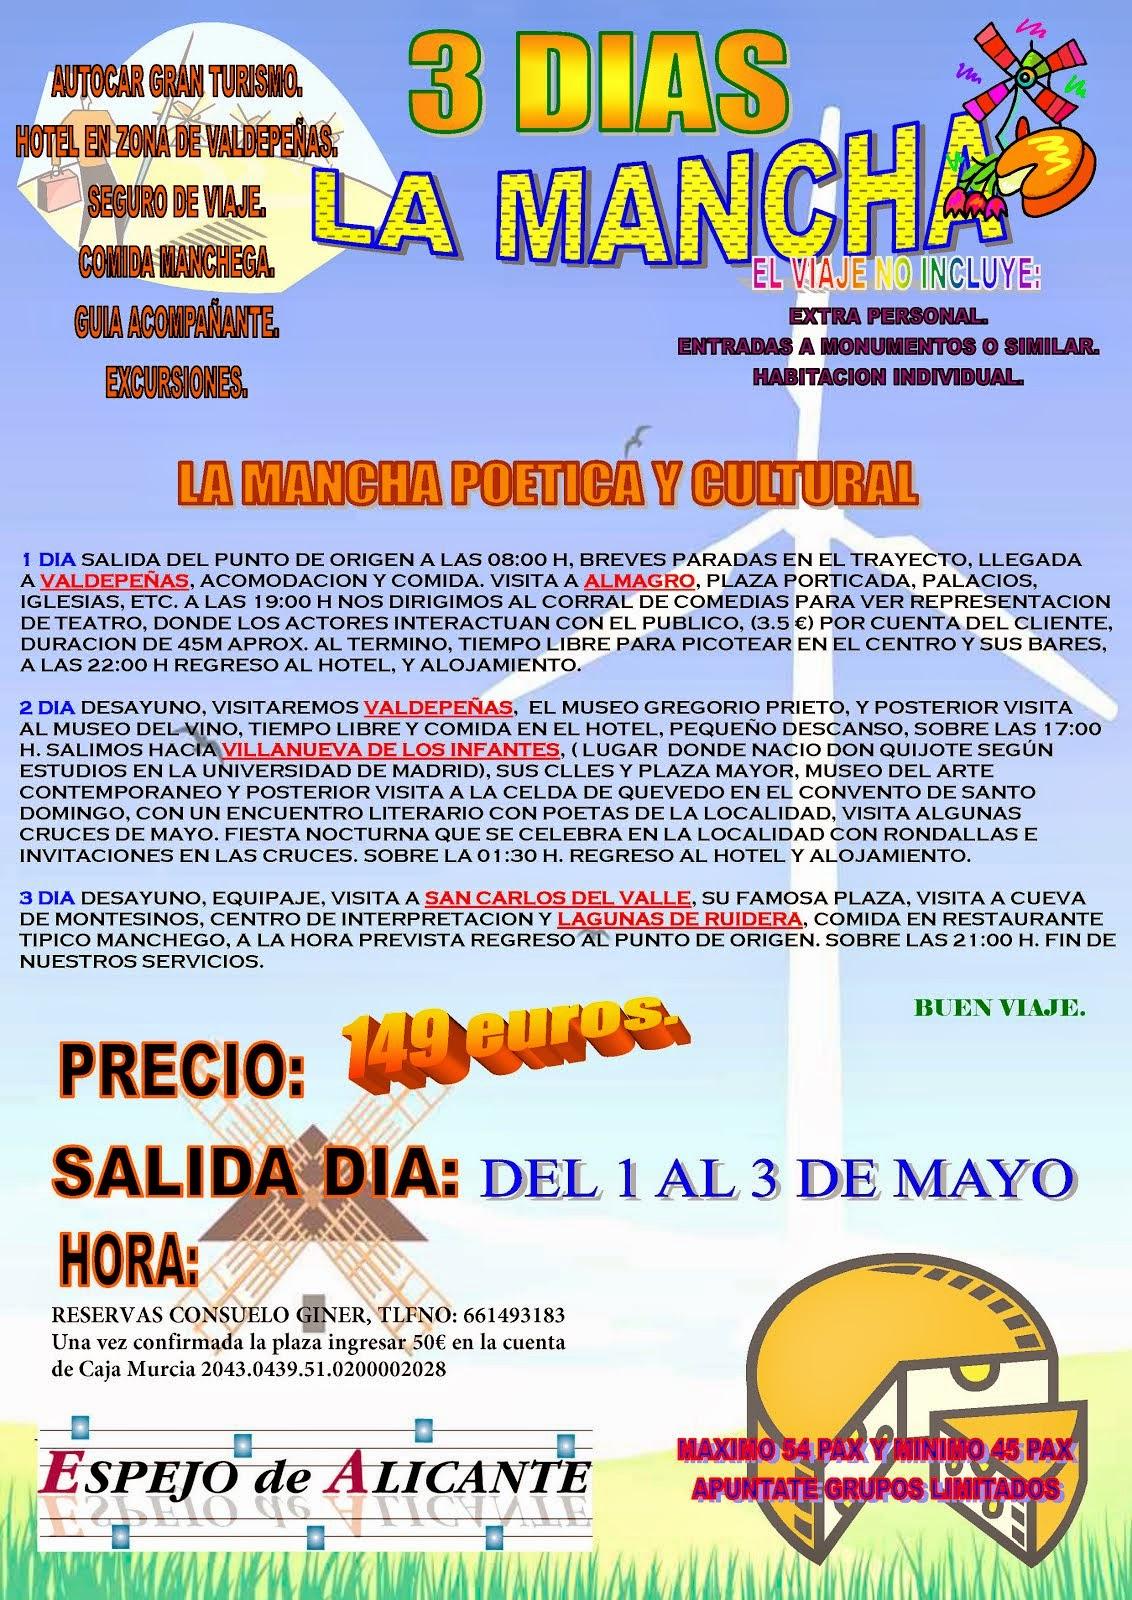 "Viaje La Mancha petico-cultural"""""